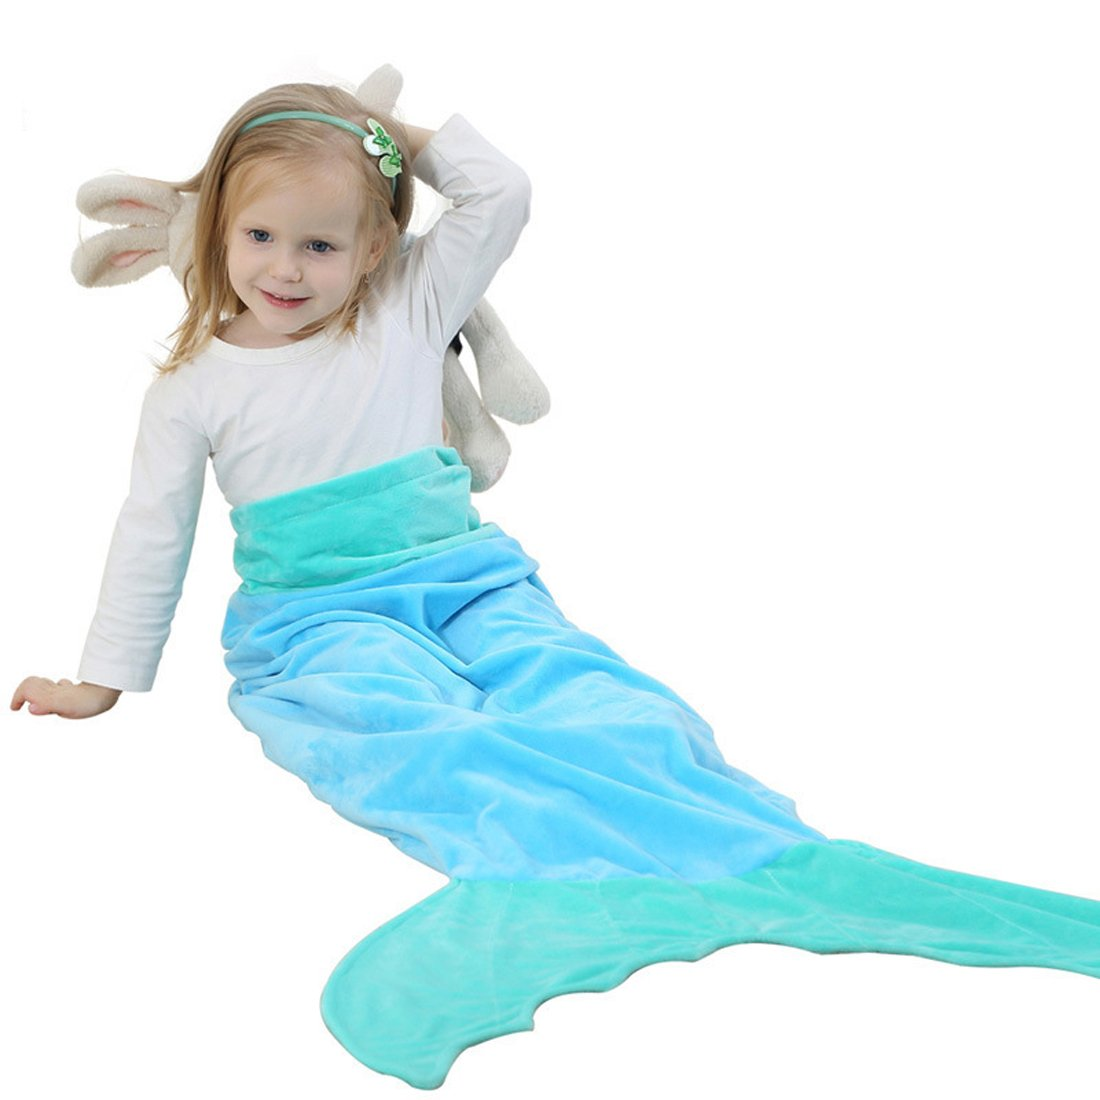 belifecosマーメイドテールBlanket for Kids / Teen Girls Sleepingバッグ(ブルー) 53x22inch(0-8years old) Blue Mermaid B076MPMZLG